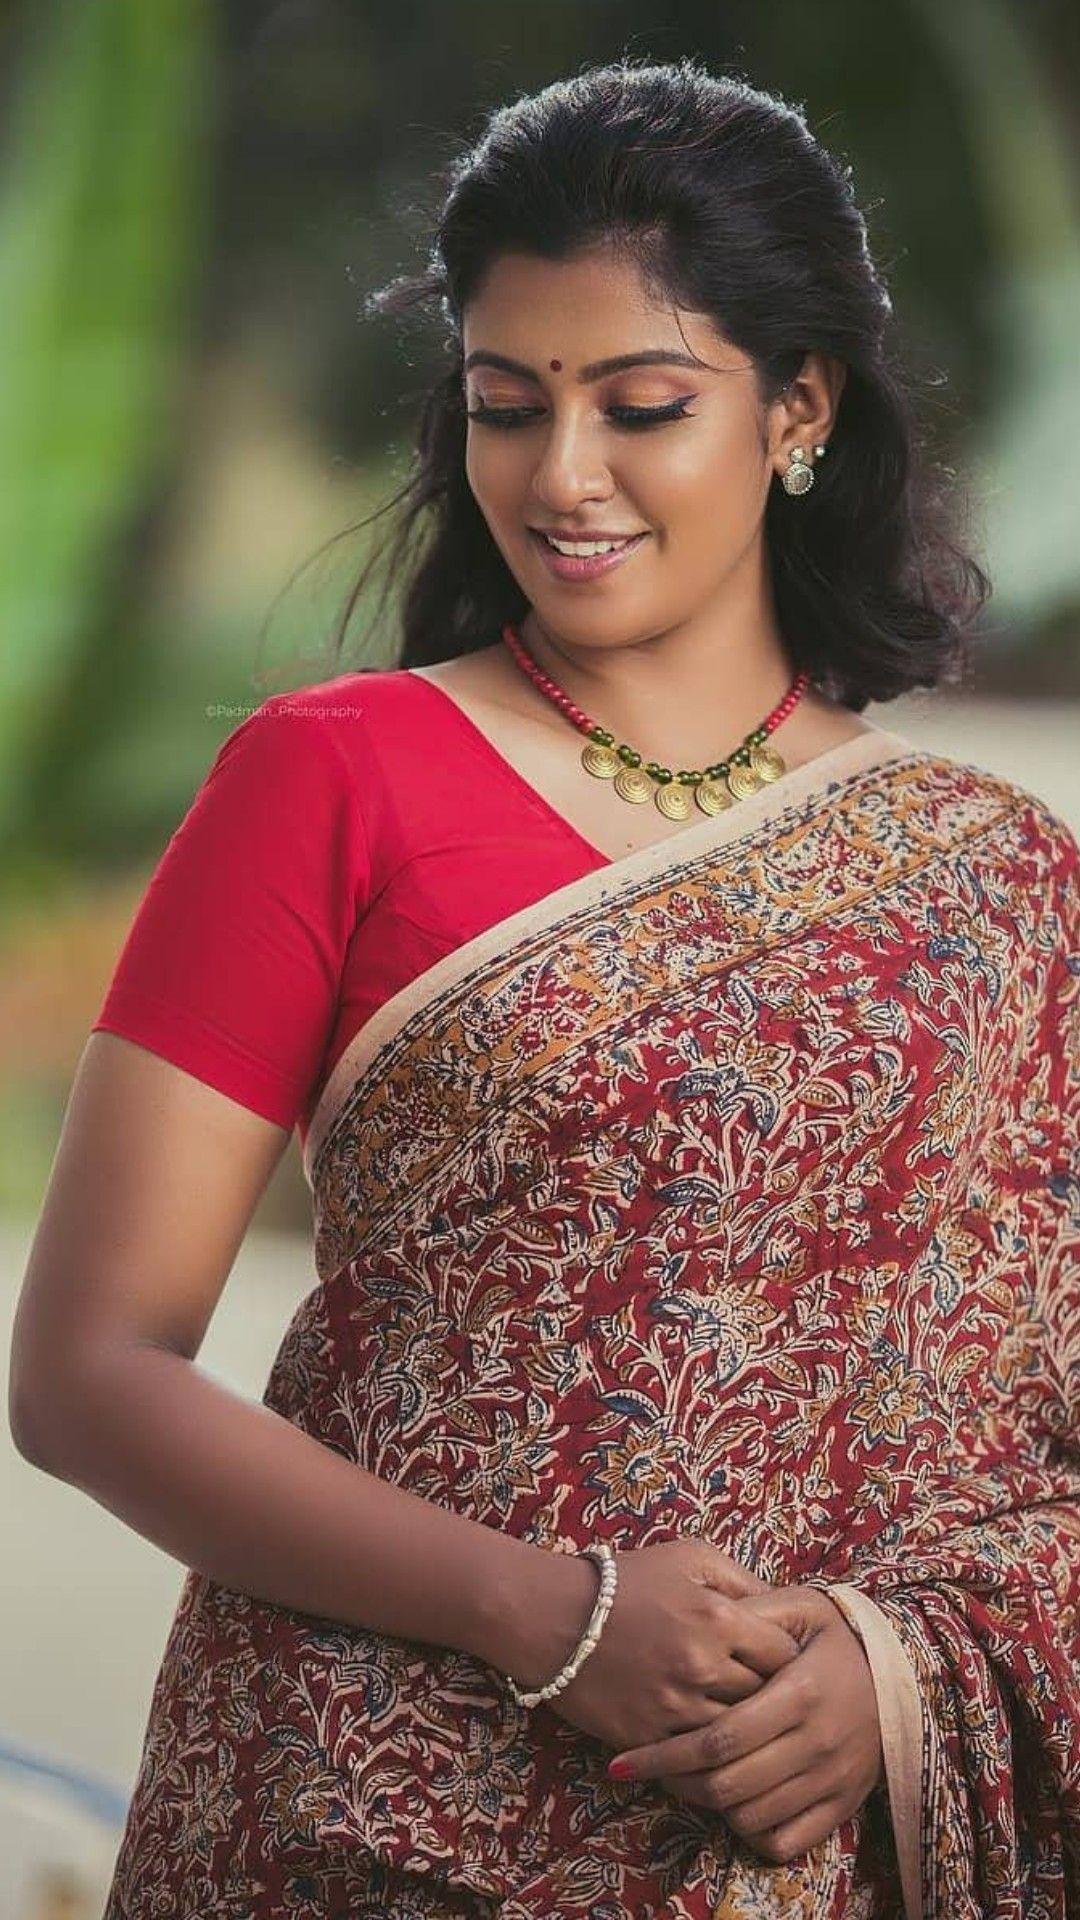 Beautiful Indian woman Indian Aunty, Indian Ethnic, Indian Girls, Beautiful  Saree, Indian f230acd6bb